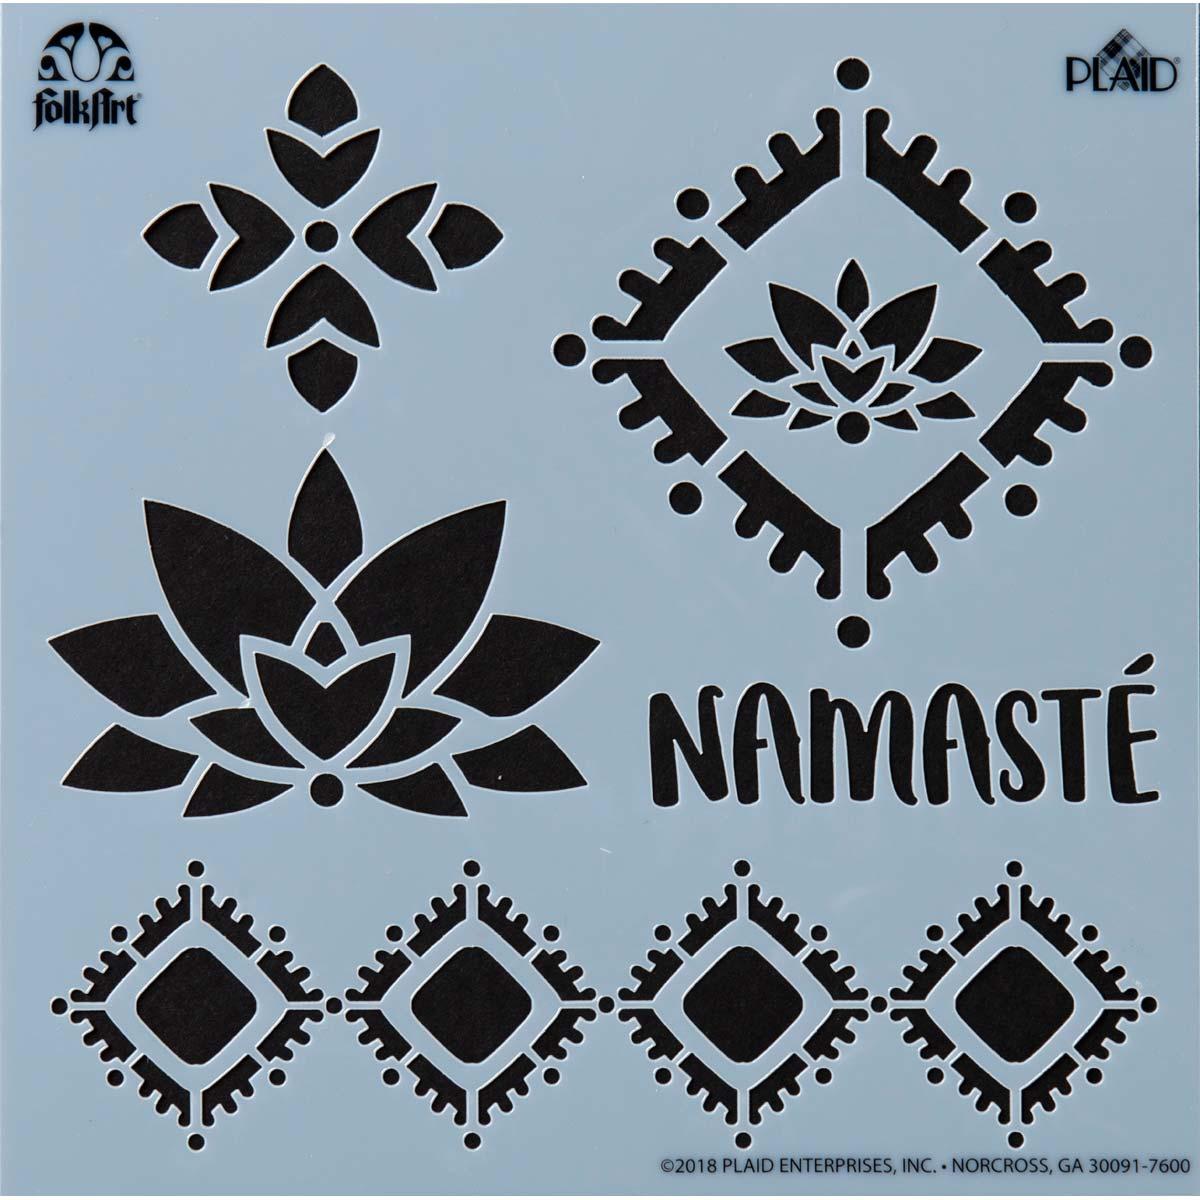 FolkArt ® Painting Stencils - Small - Namaste - 39257